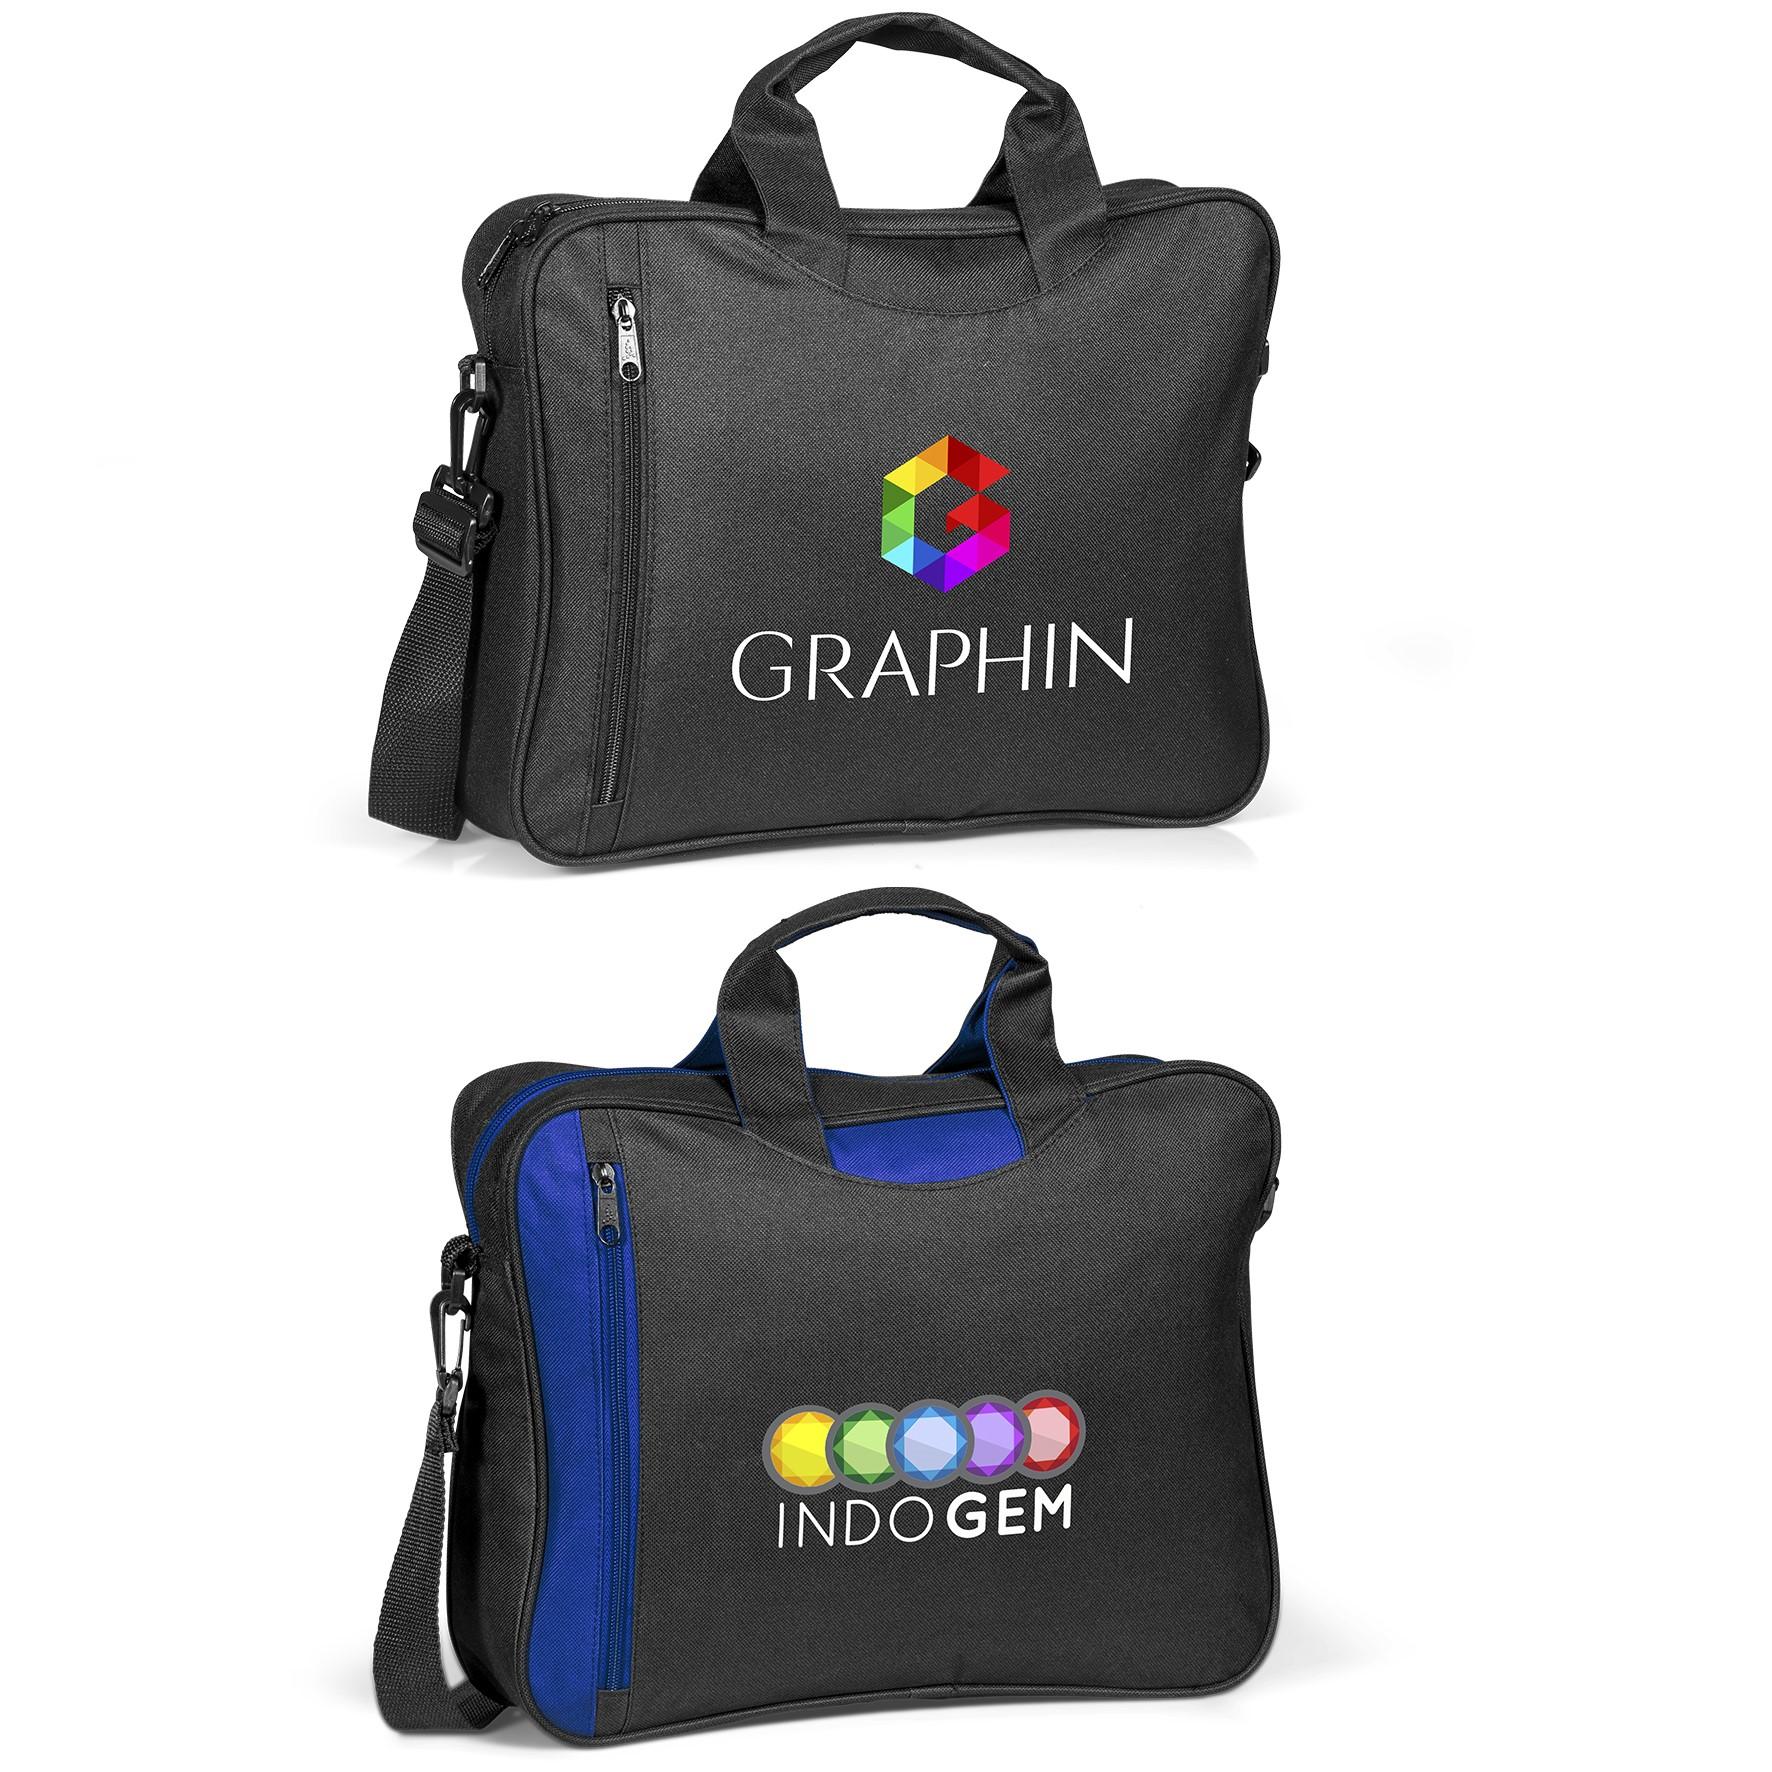 Product: Graffiti Conference Bag